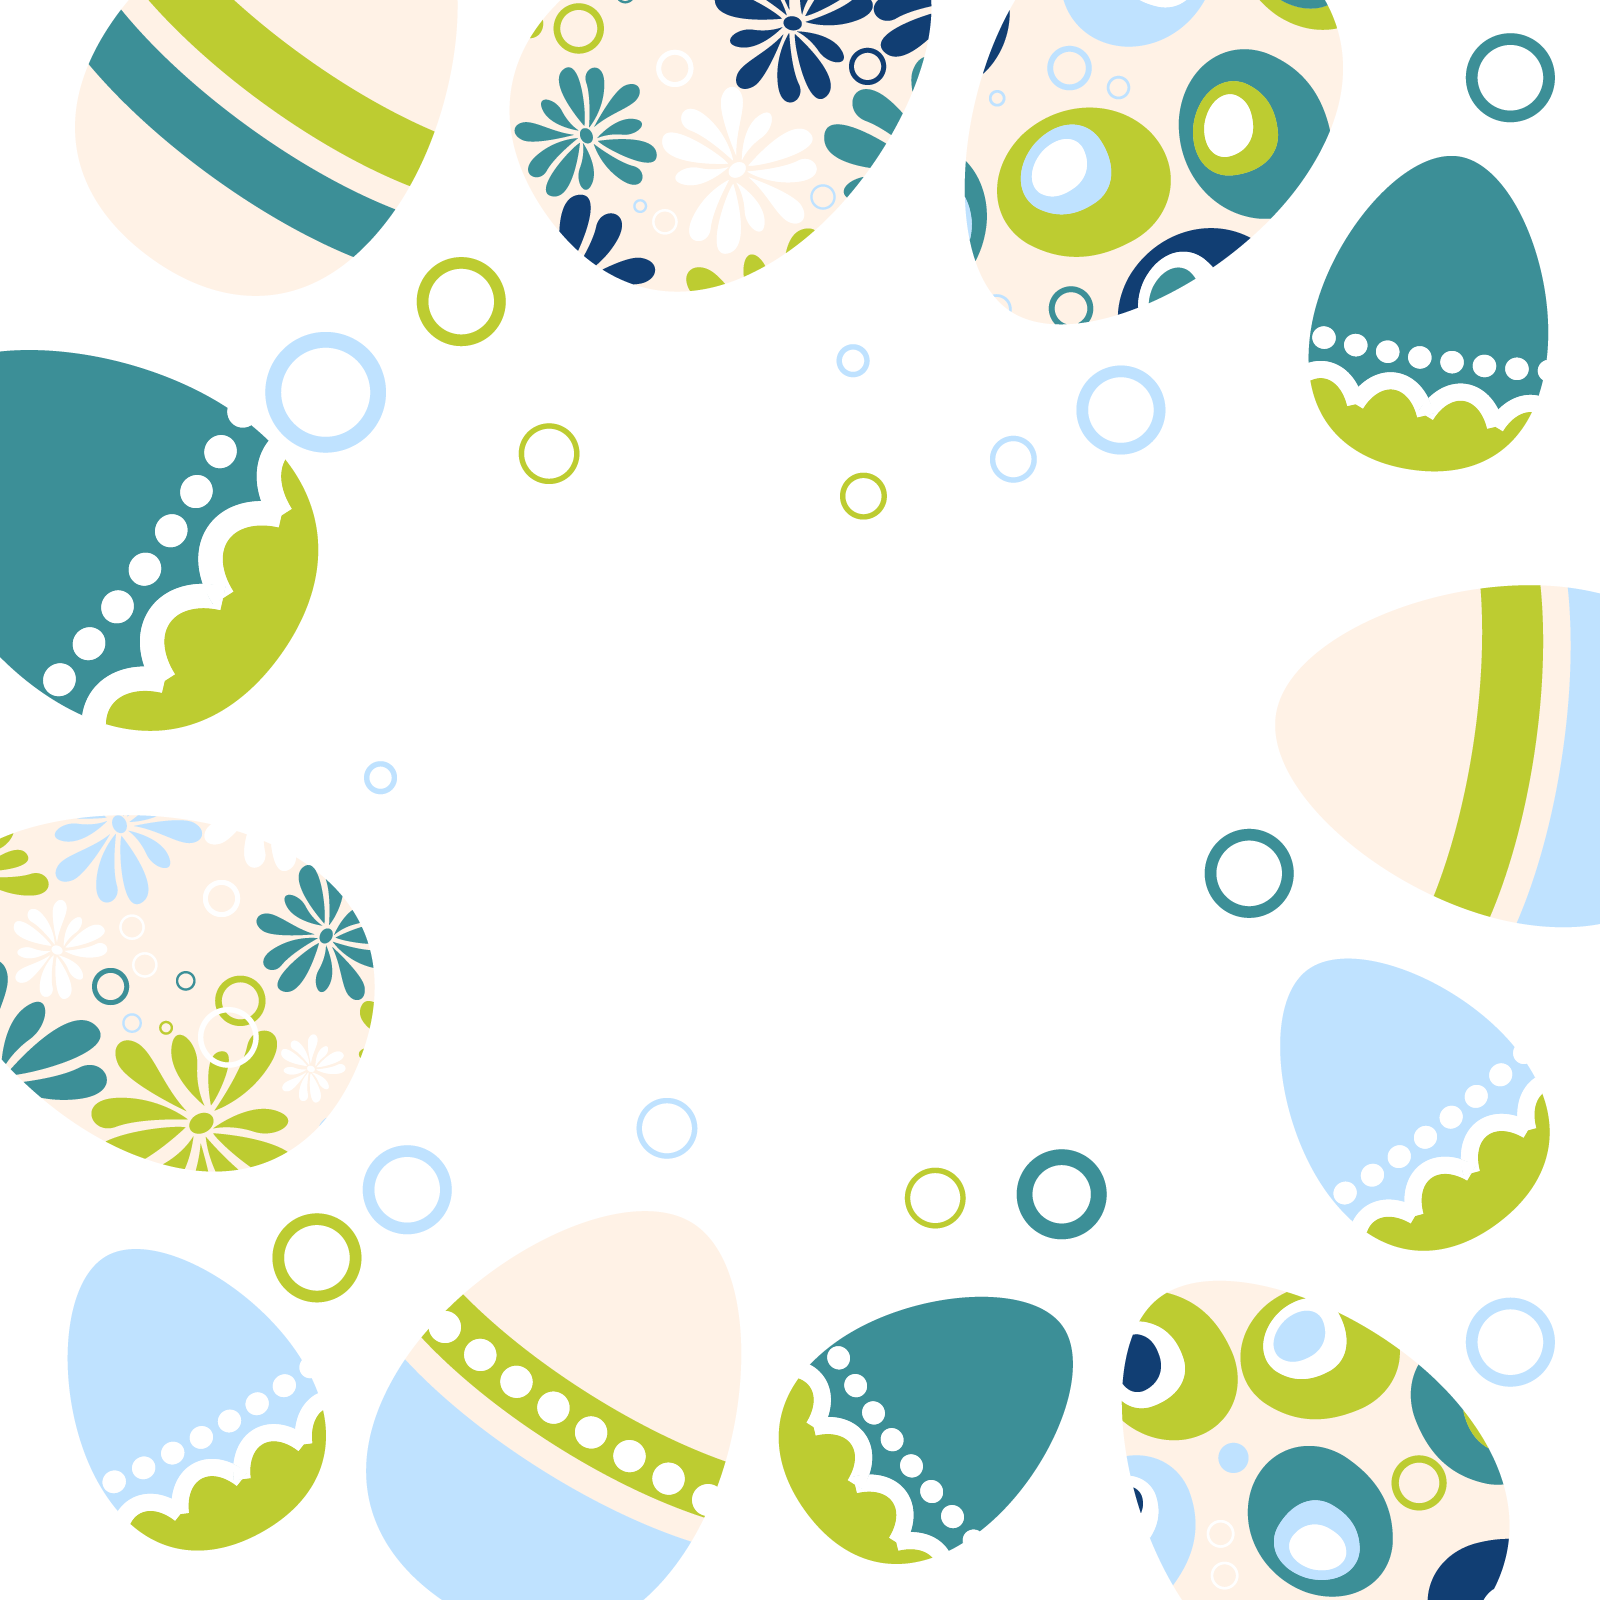 Decorative Easter Border Free PNG Image